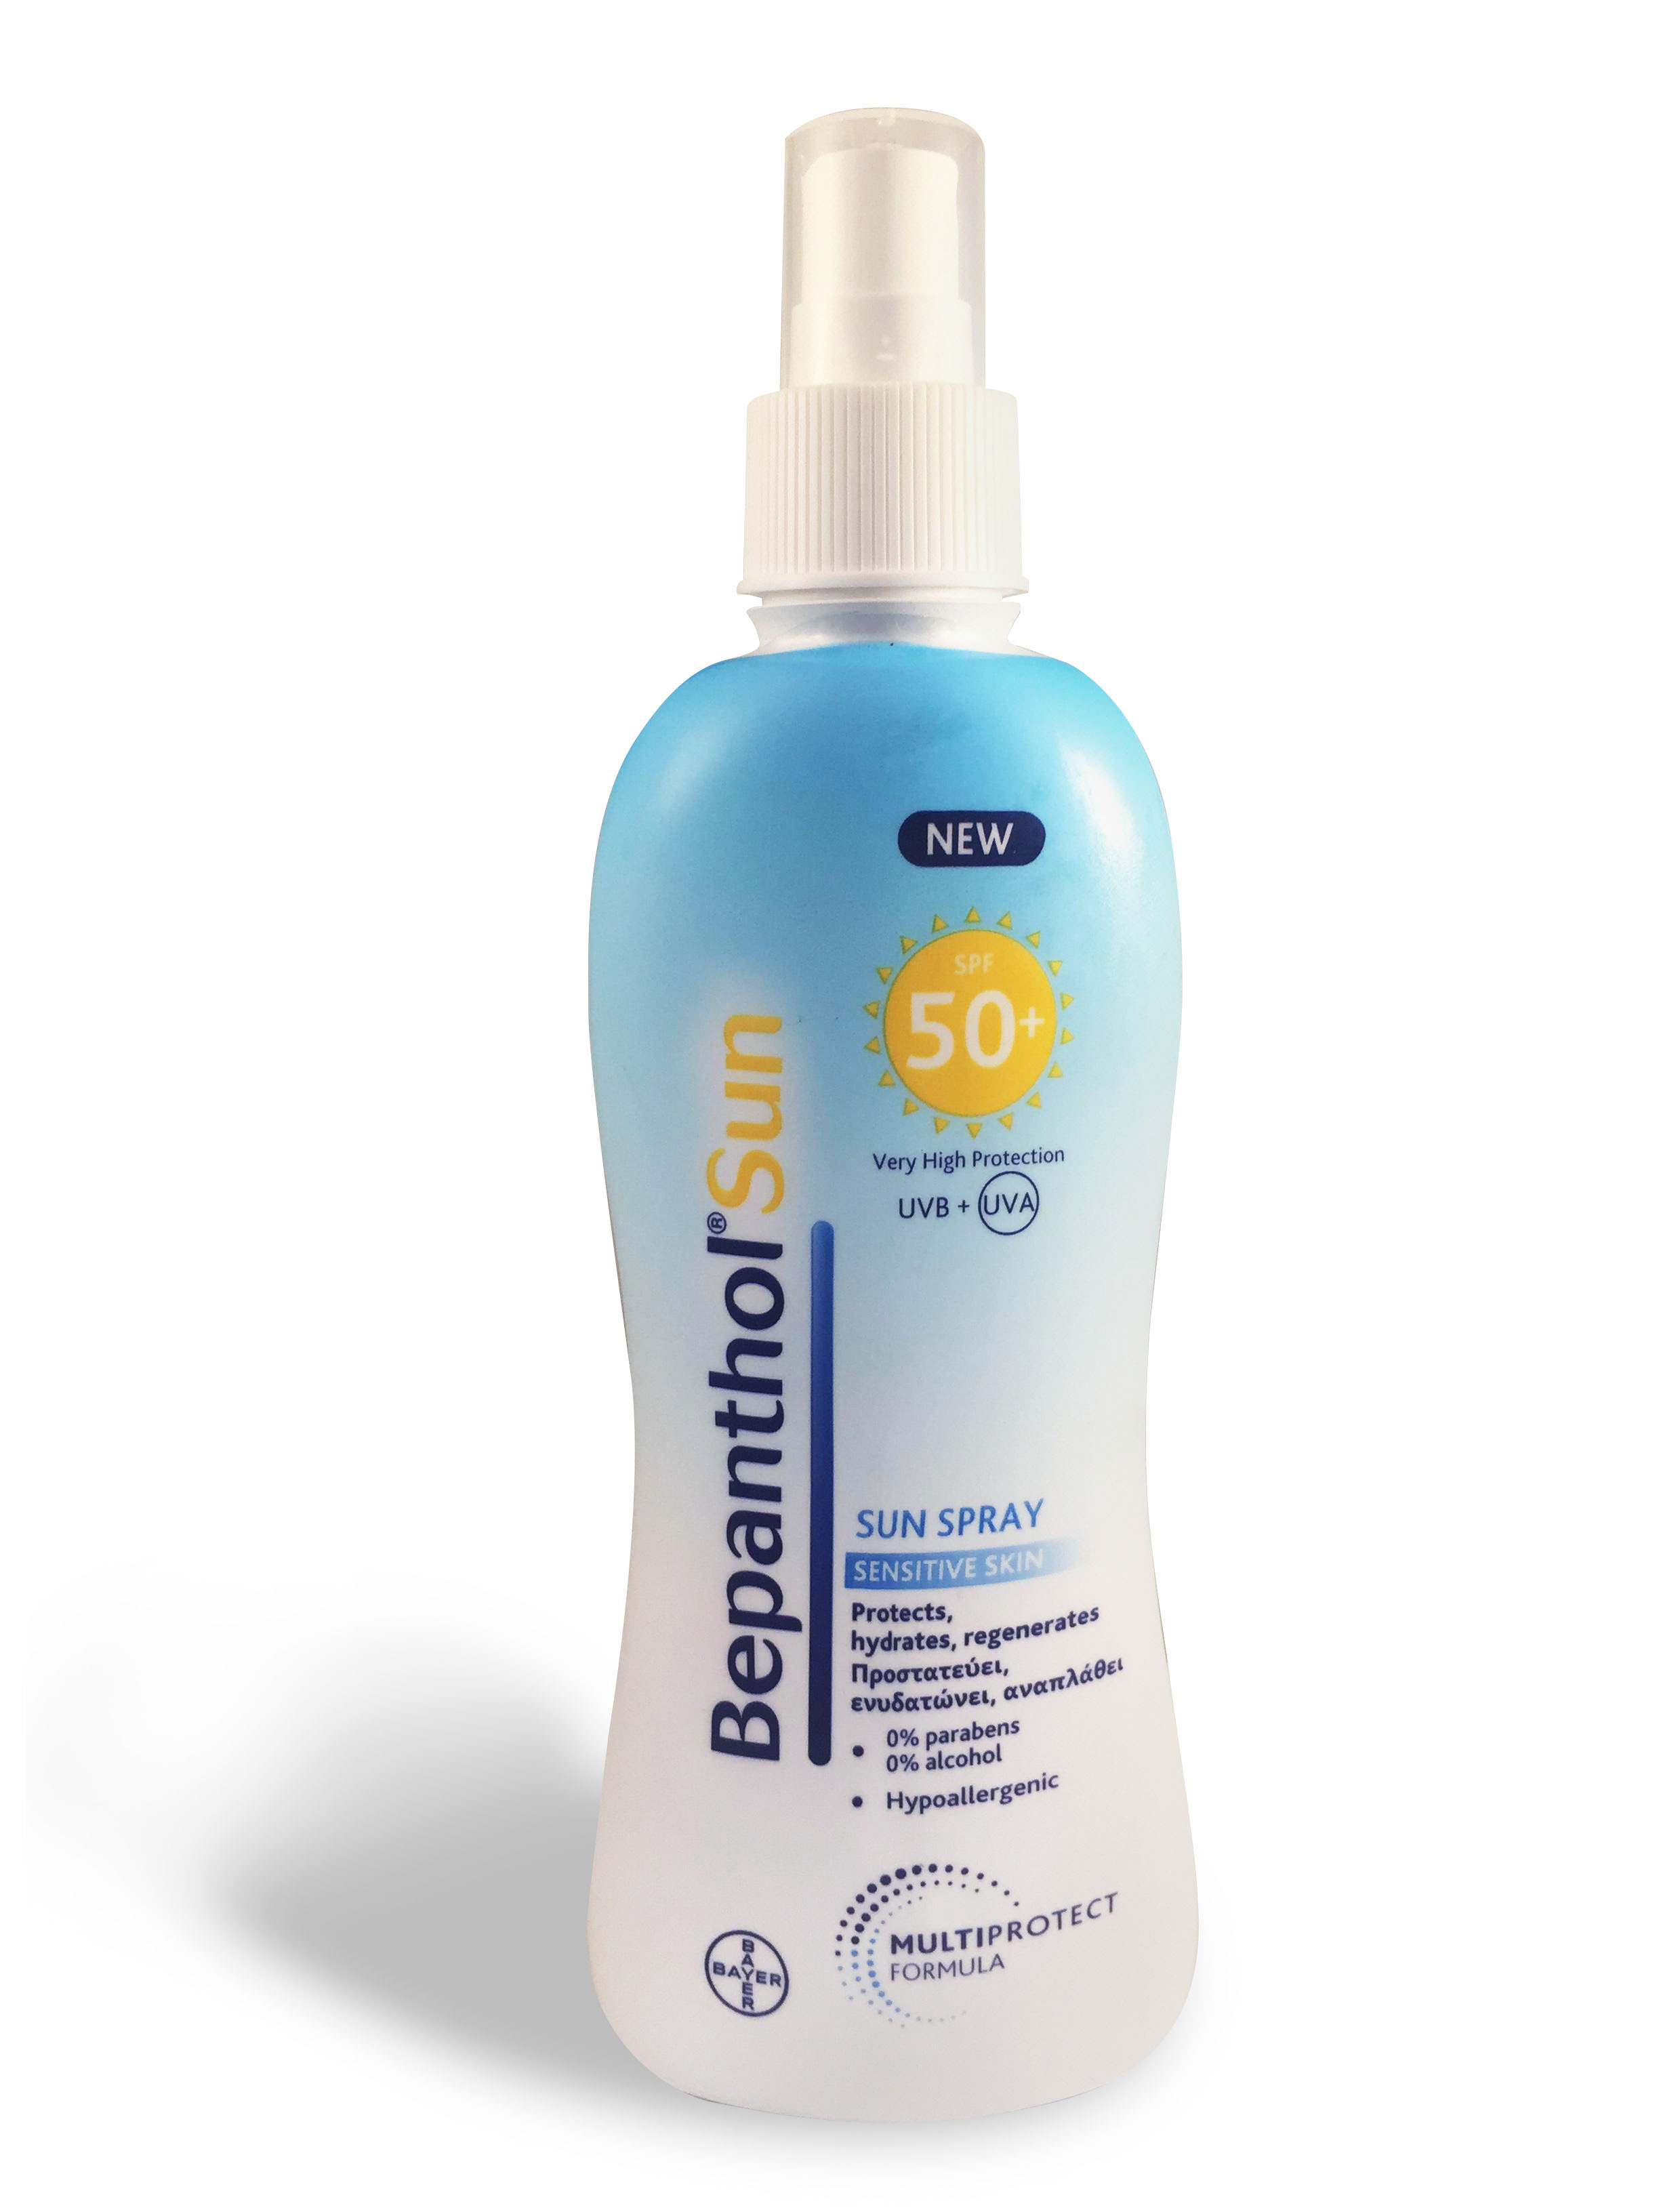 Bepanthol Sun Lotion Spray SPF50+ Αντηλιακό Γαλάκτωμα Σώματος για το ευαίσθητο δέρμα, 200ml